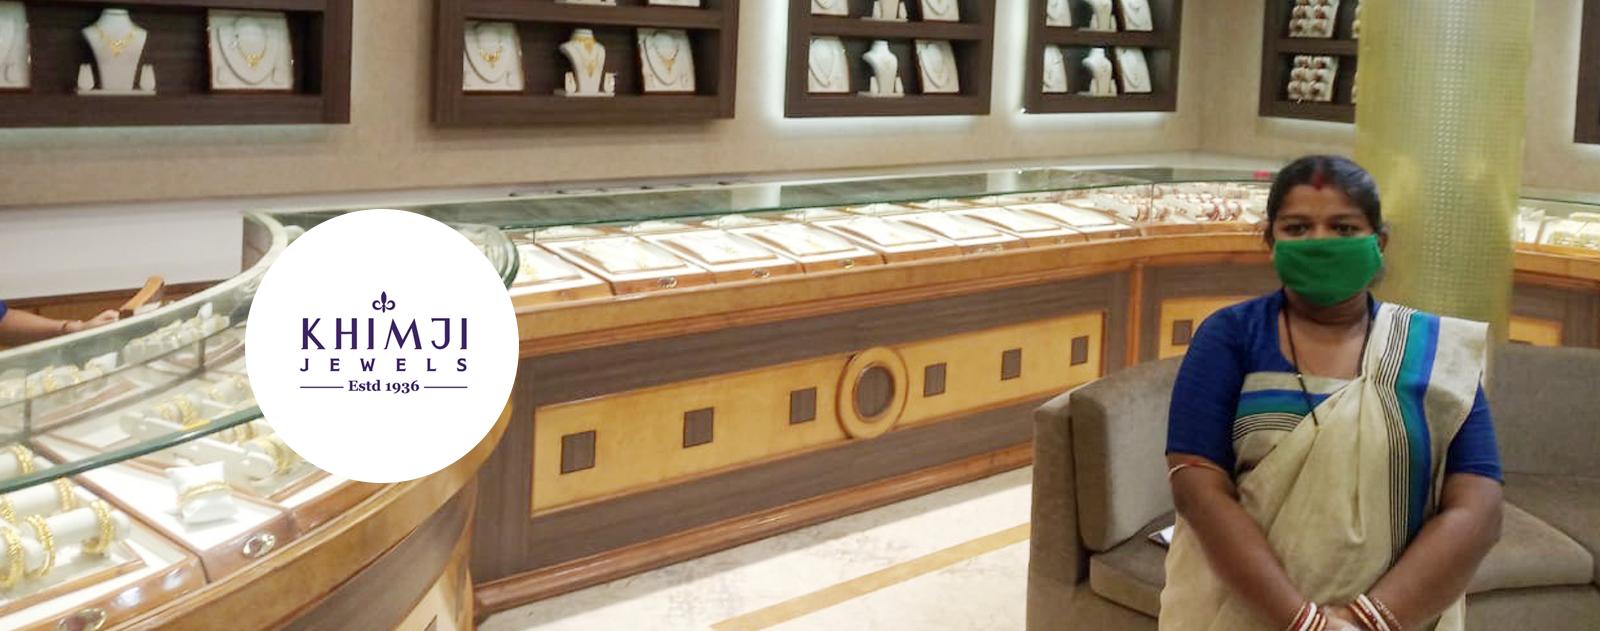 Pine Labs Merchants Success Stories: Khimji Jewellers